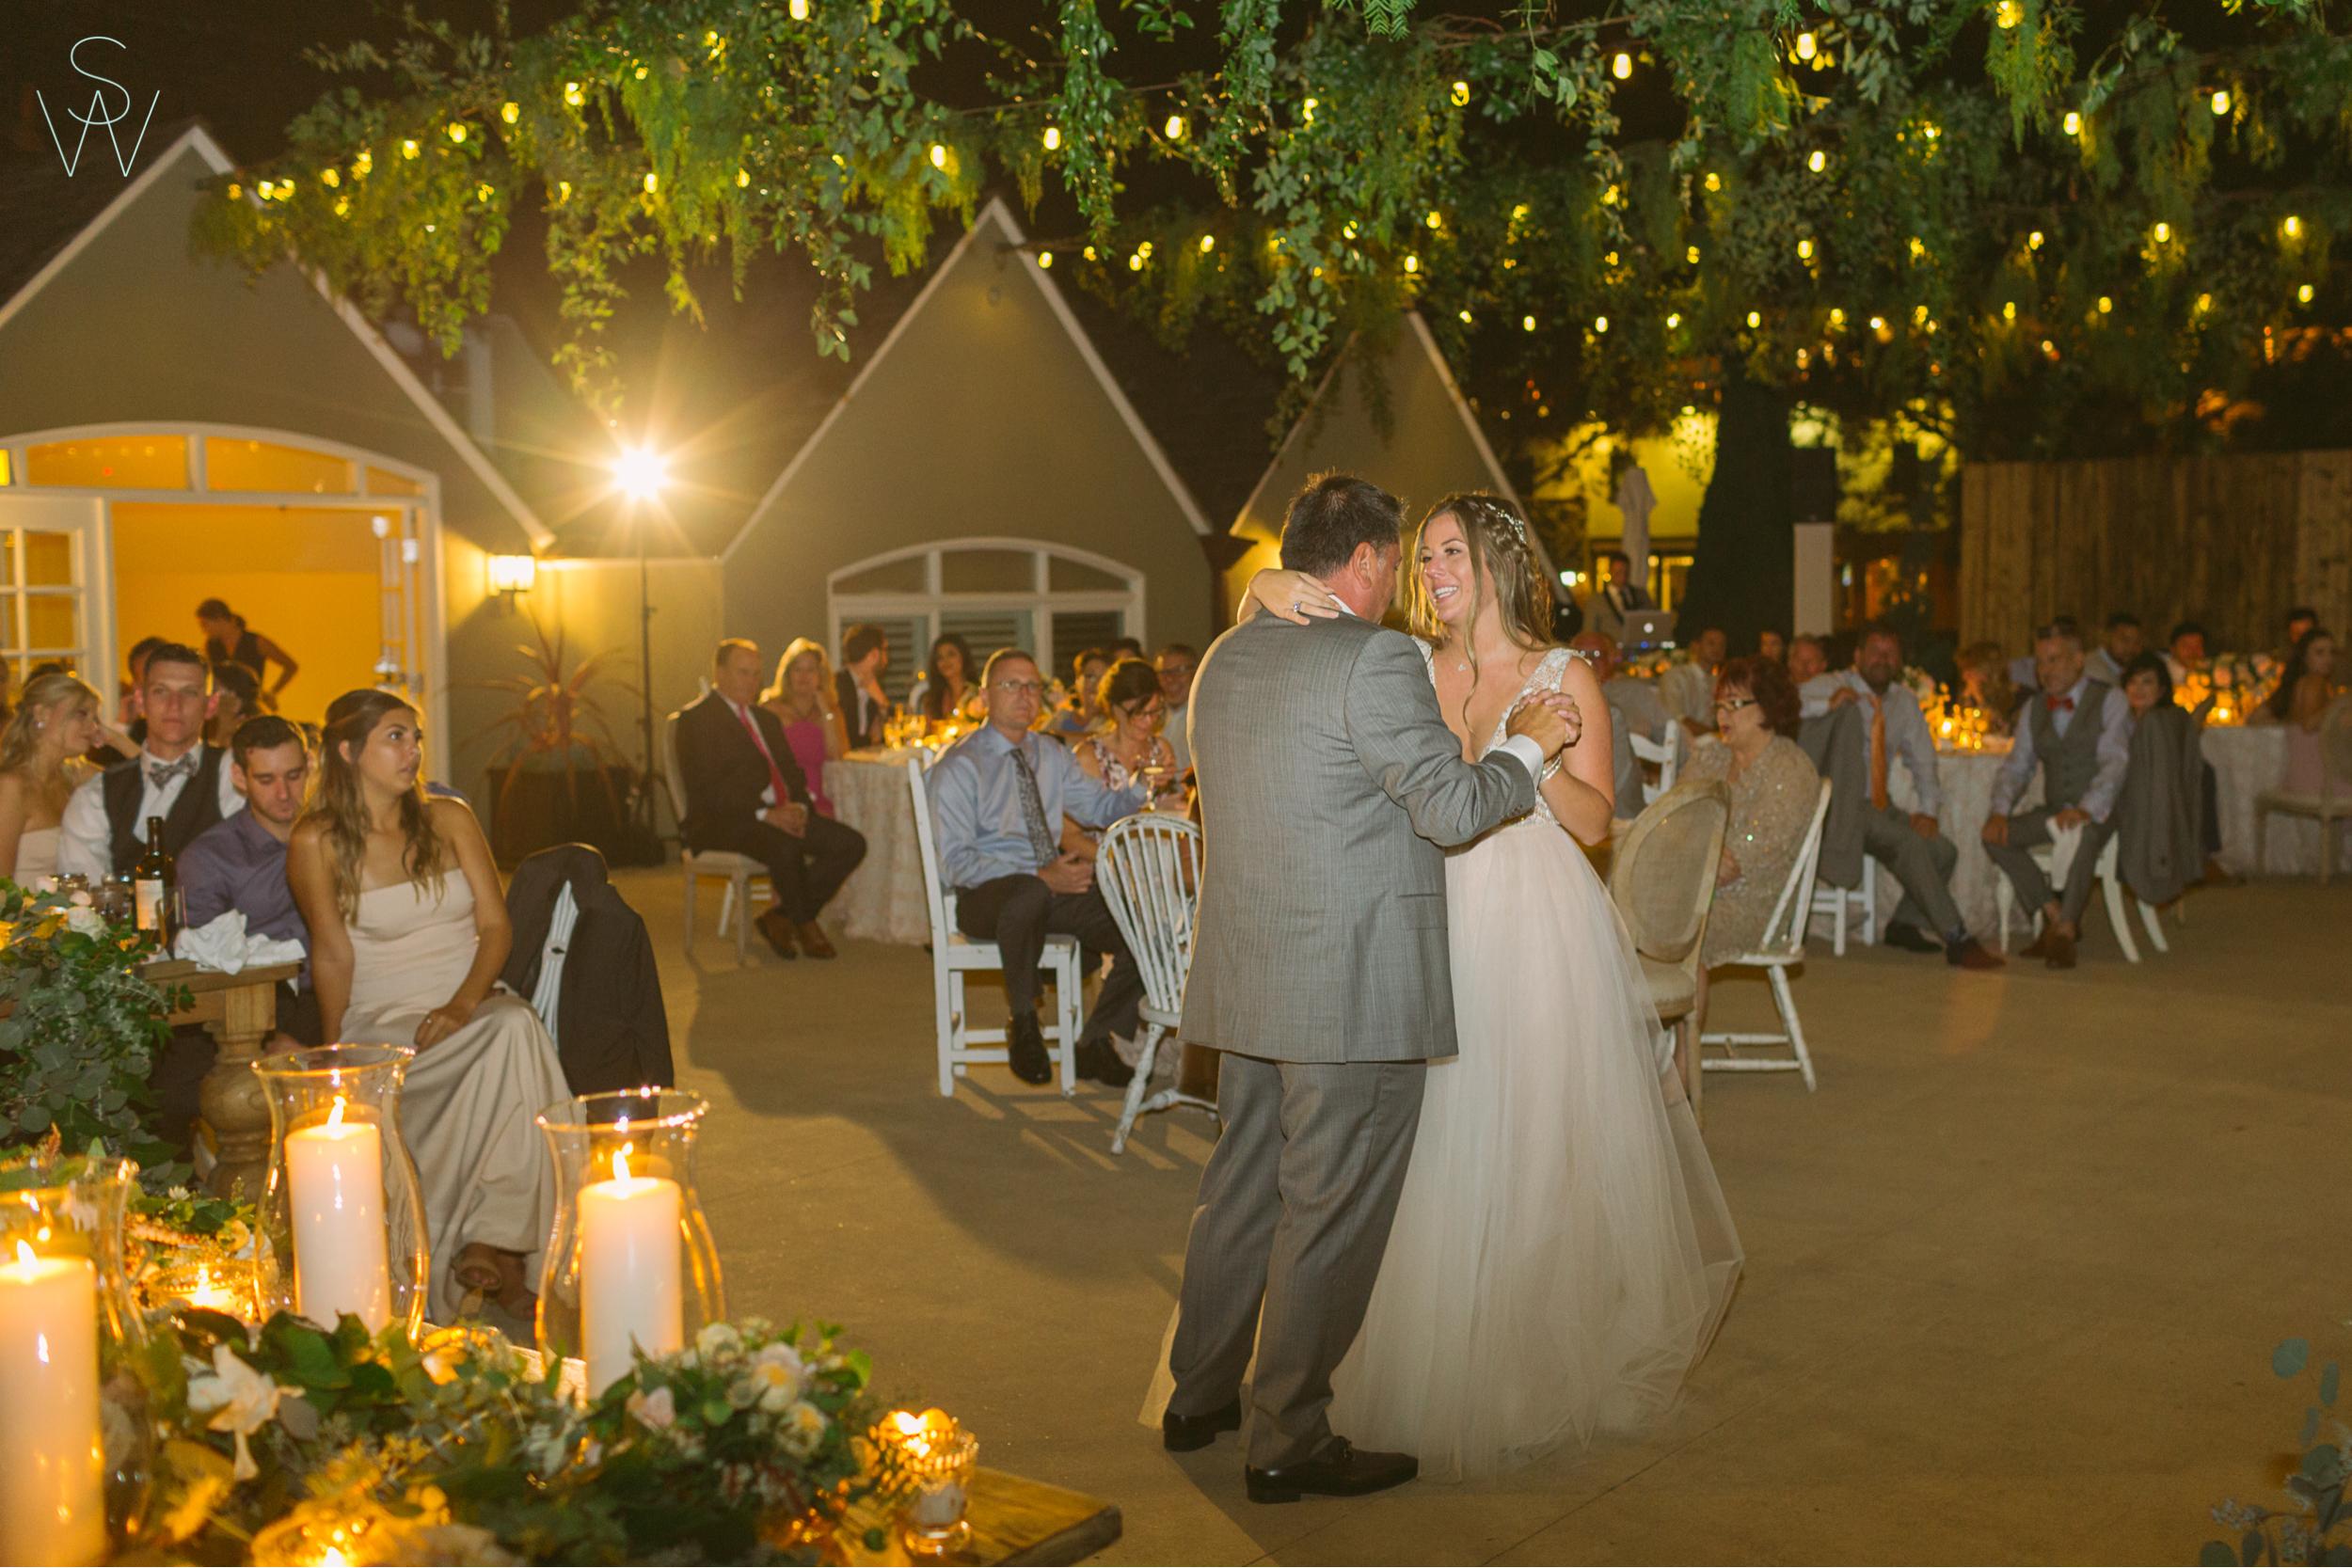 226Lauberge.shewanders.wedding.photography.JPG